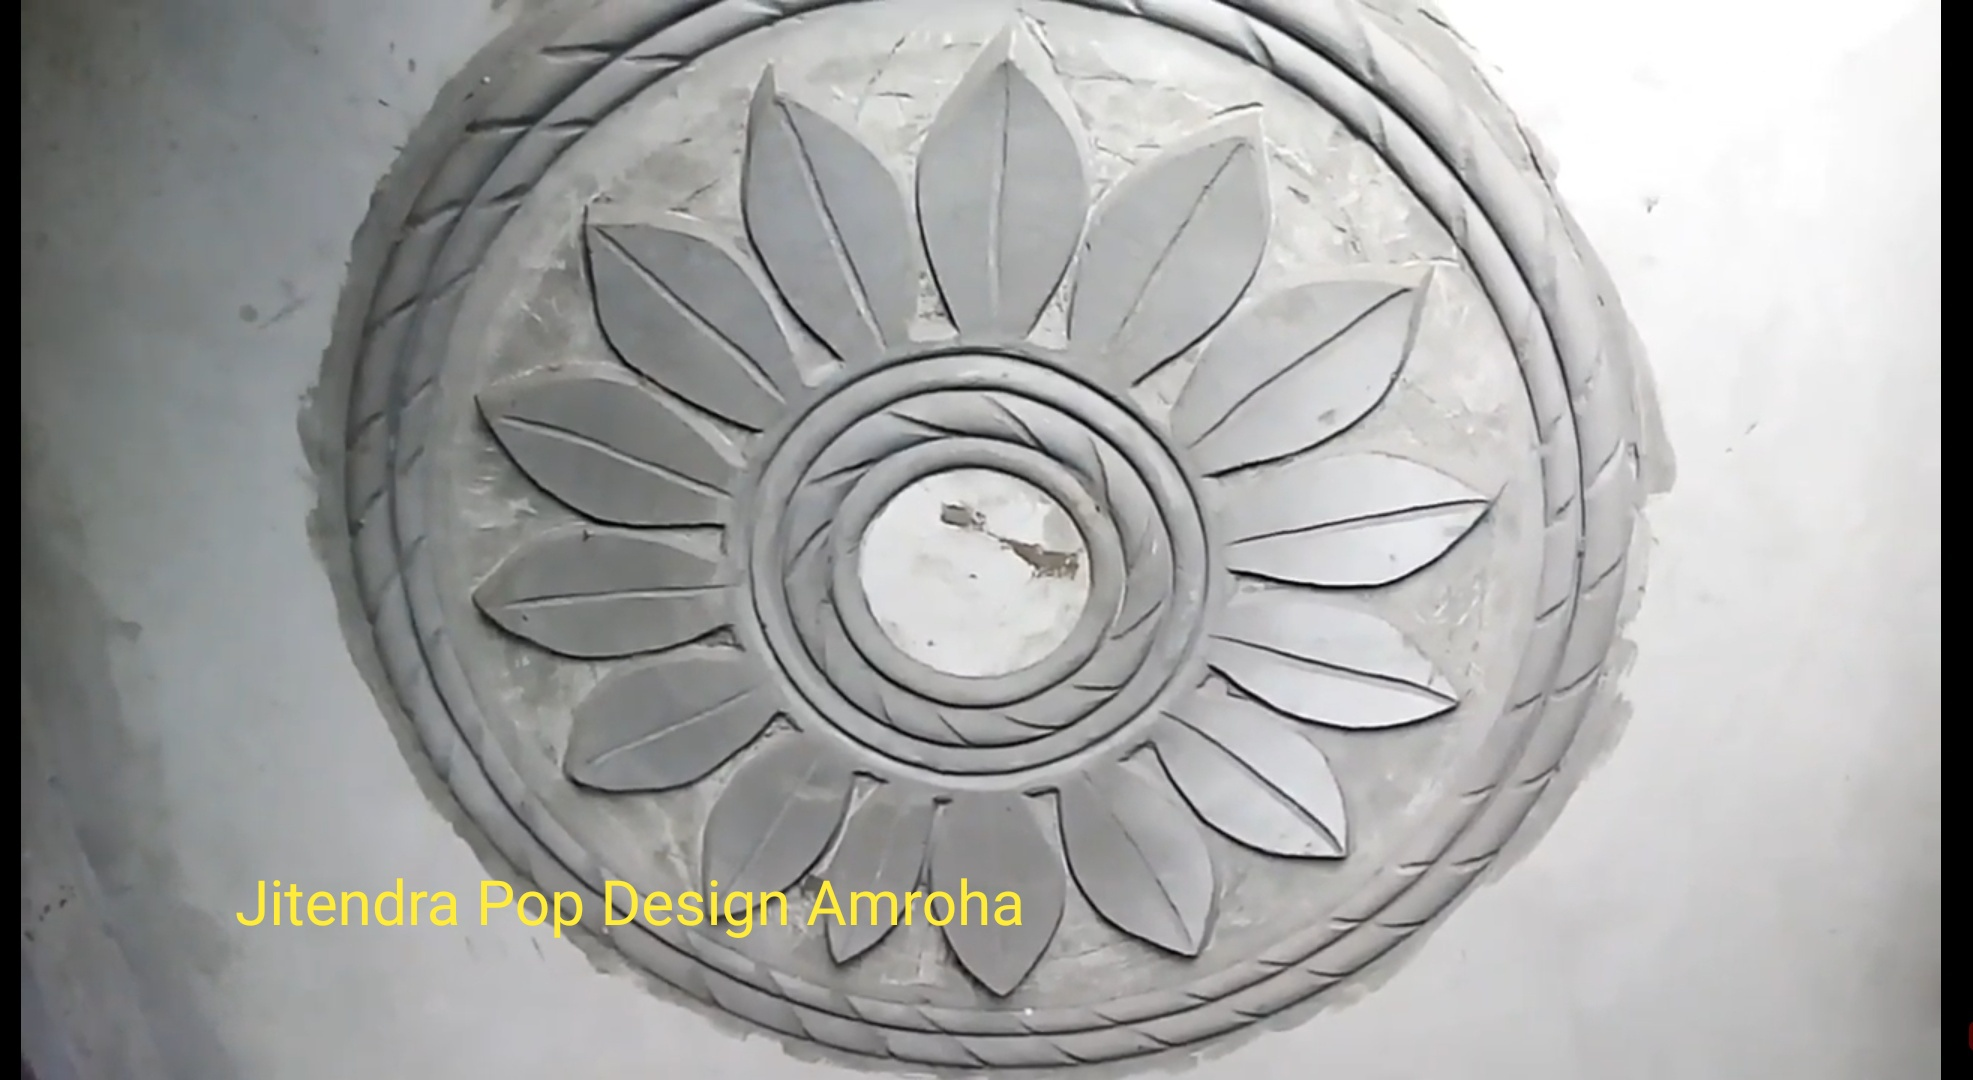 New Cement Pop Designs Images, Plus Minus Pop Design,pop Ceiling Design